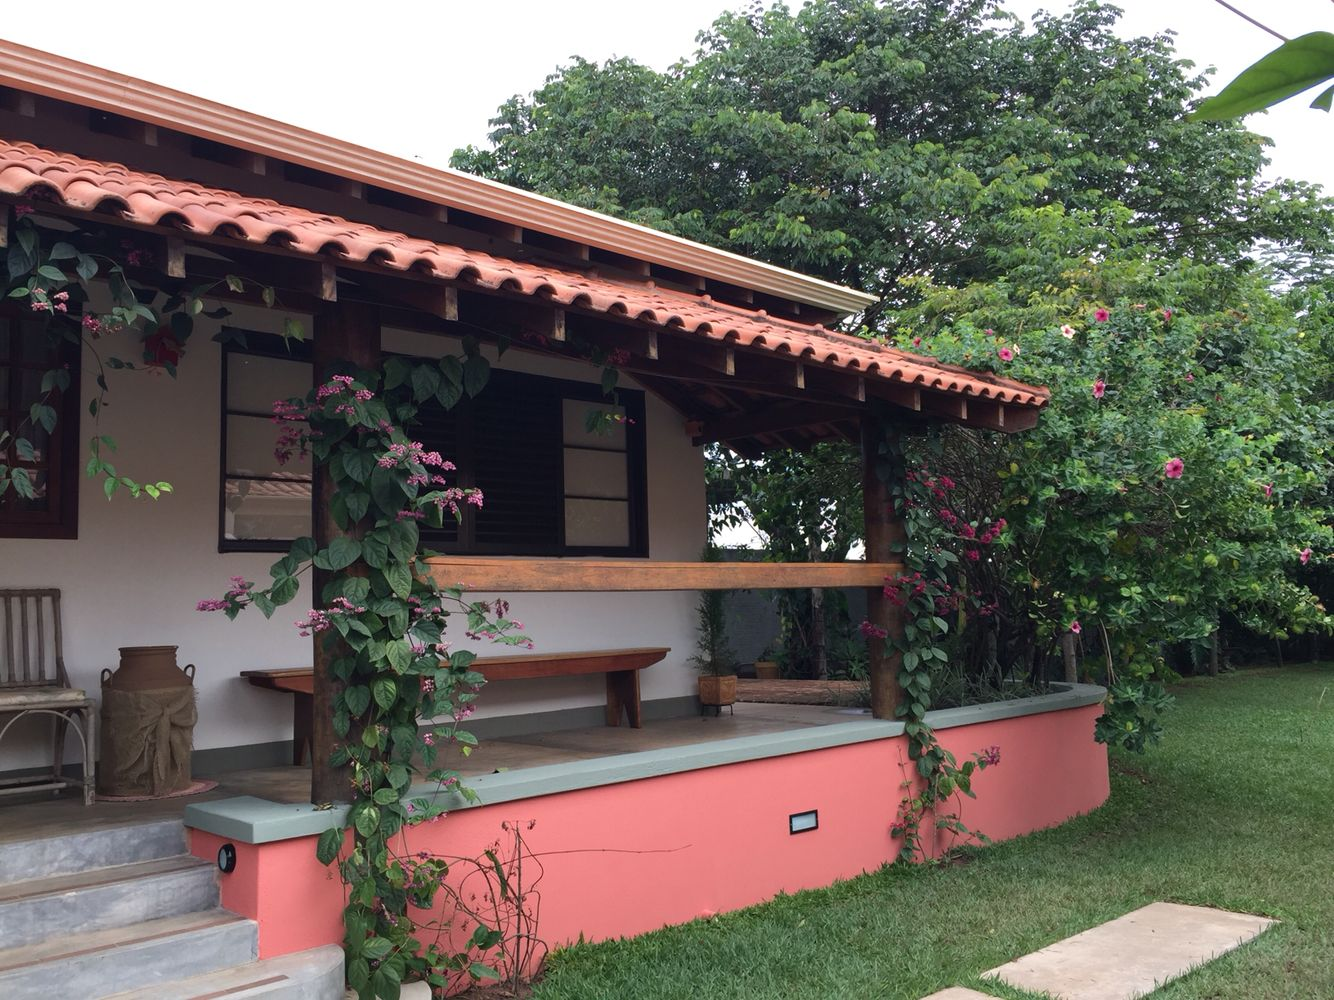 Casa no campo casa r stica casa arquitetura for Legalizar casa en terreno rustico